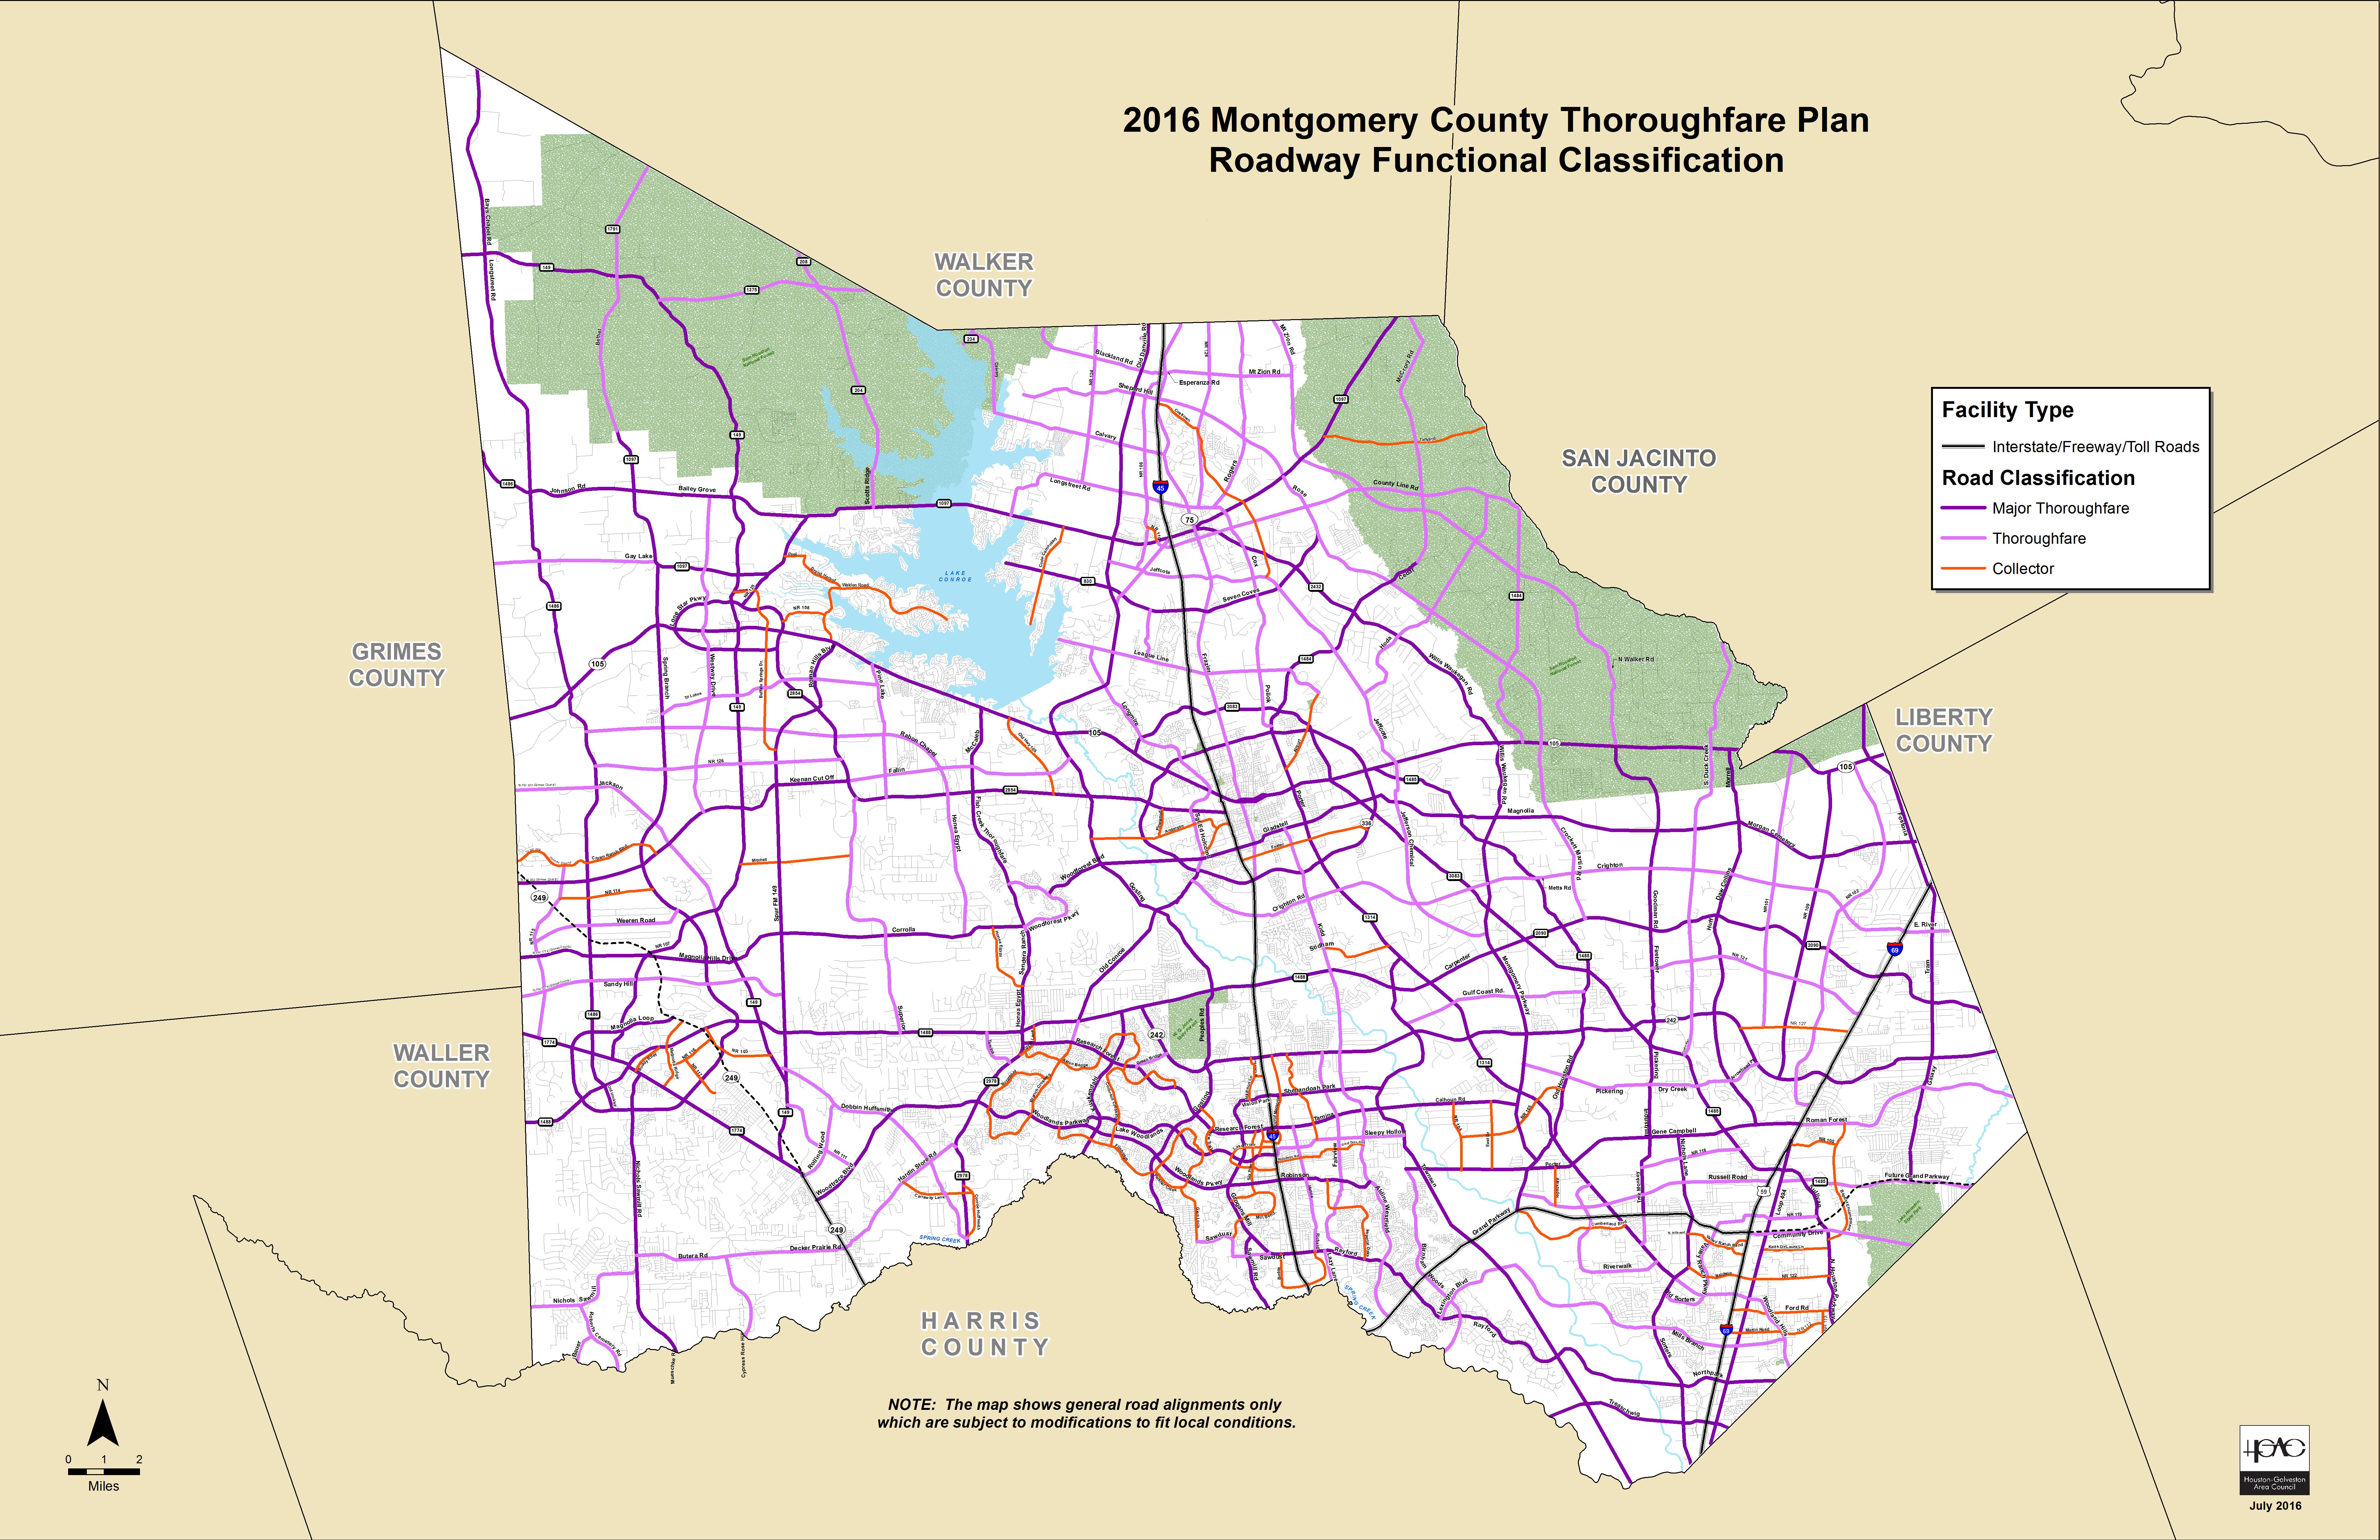 Fema Floodplain Maps Dfirm Federal Emergency Management Agency - Texas Flood Zone Map 2016